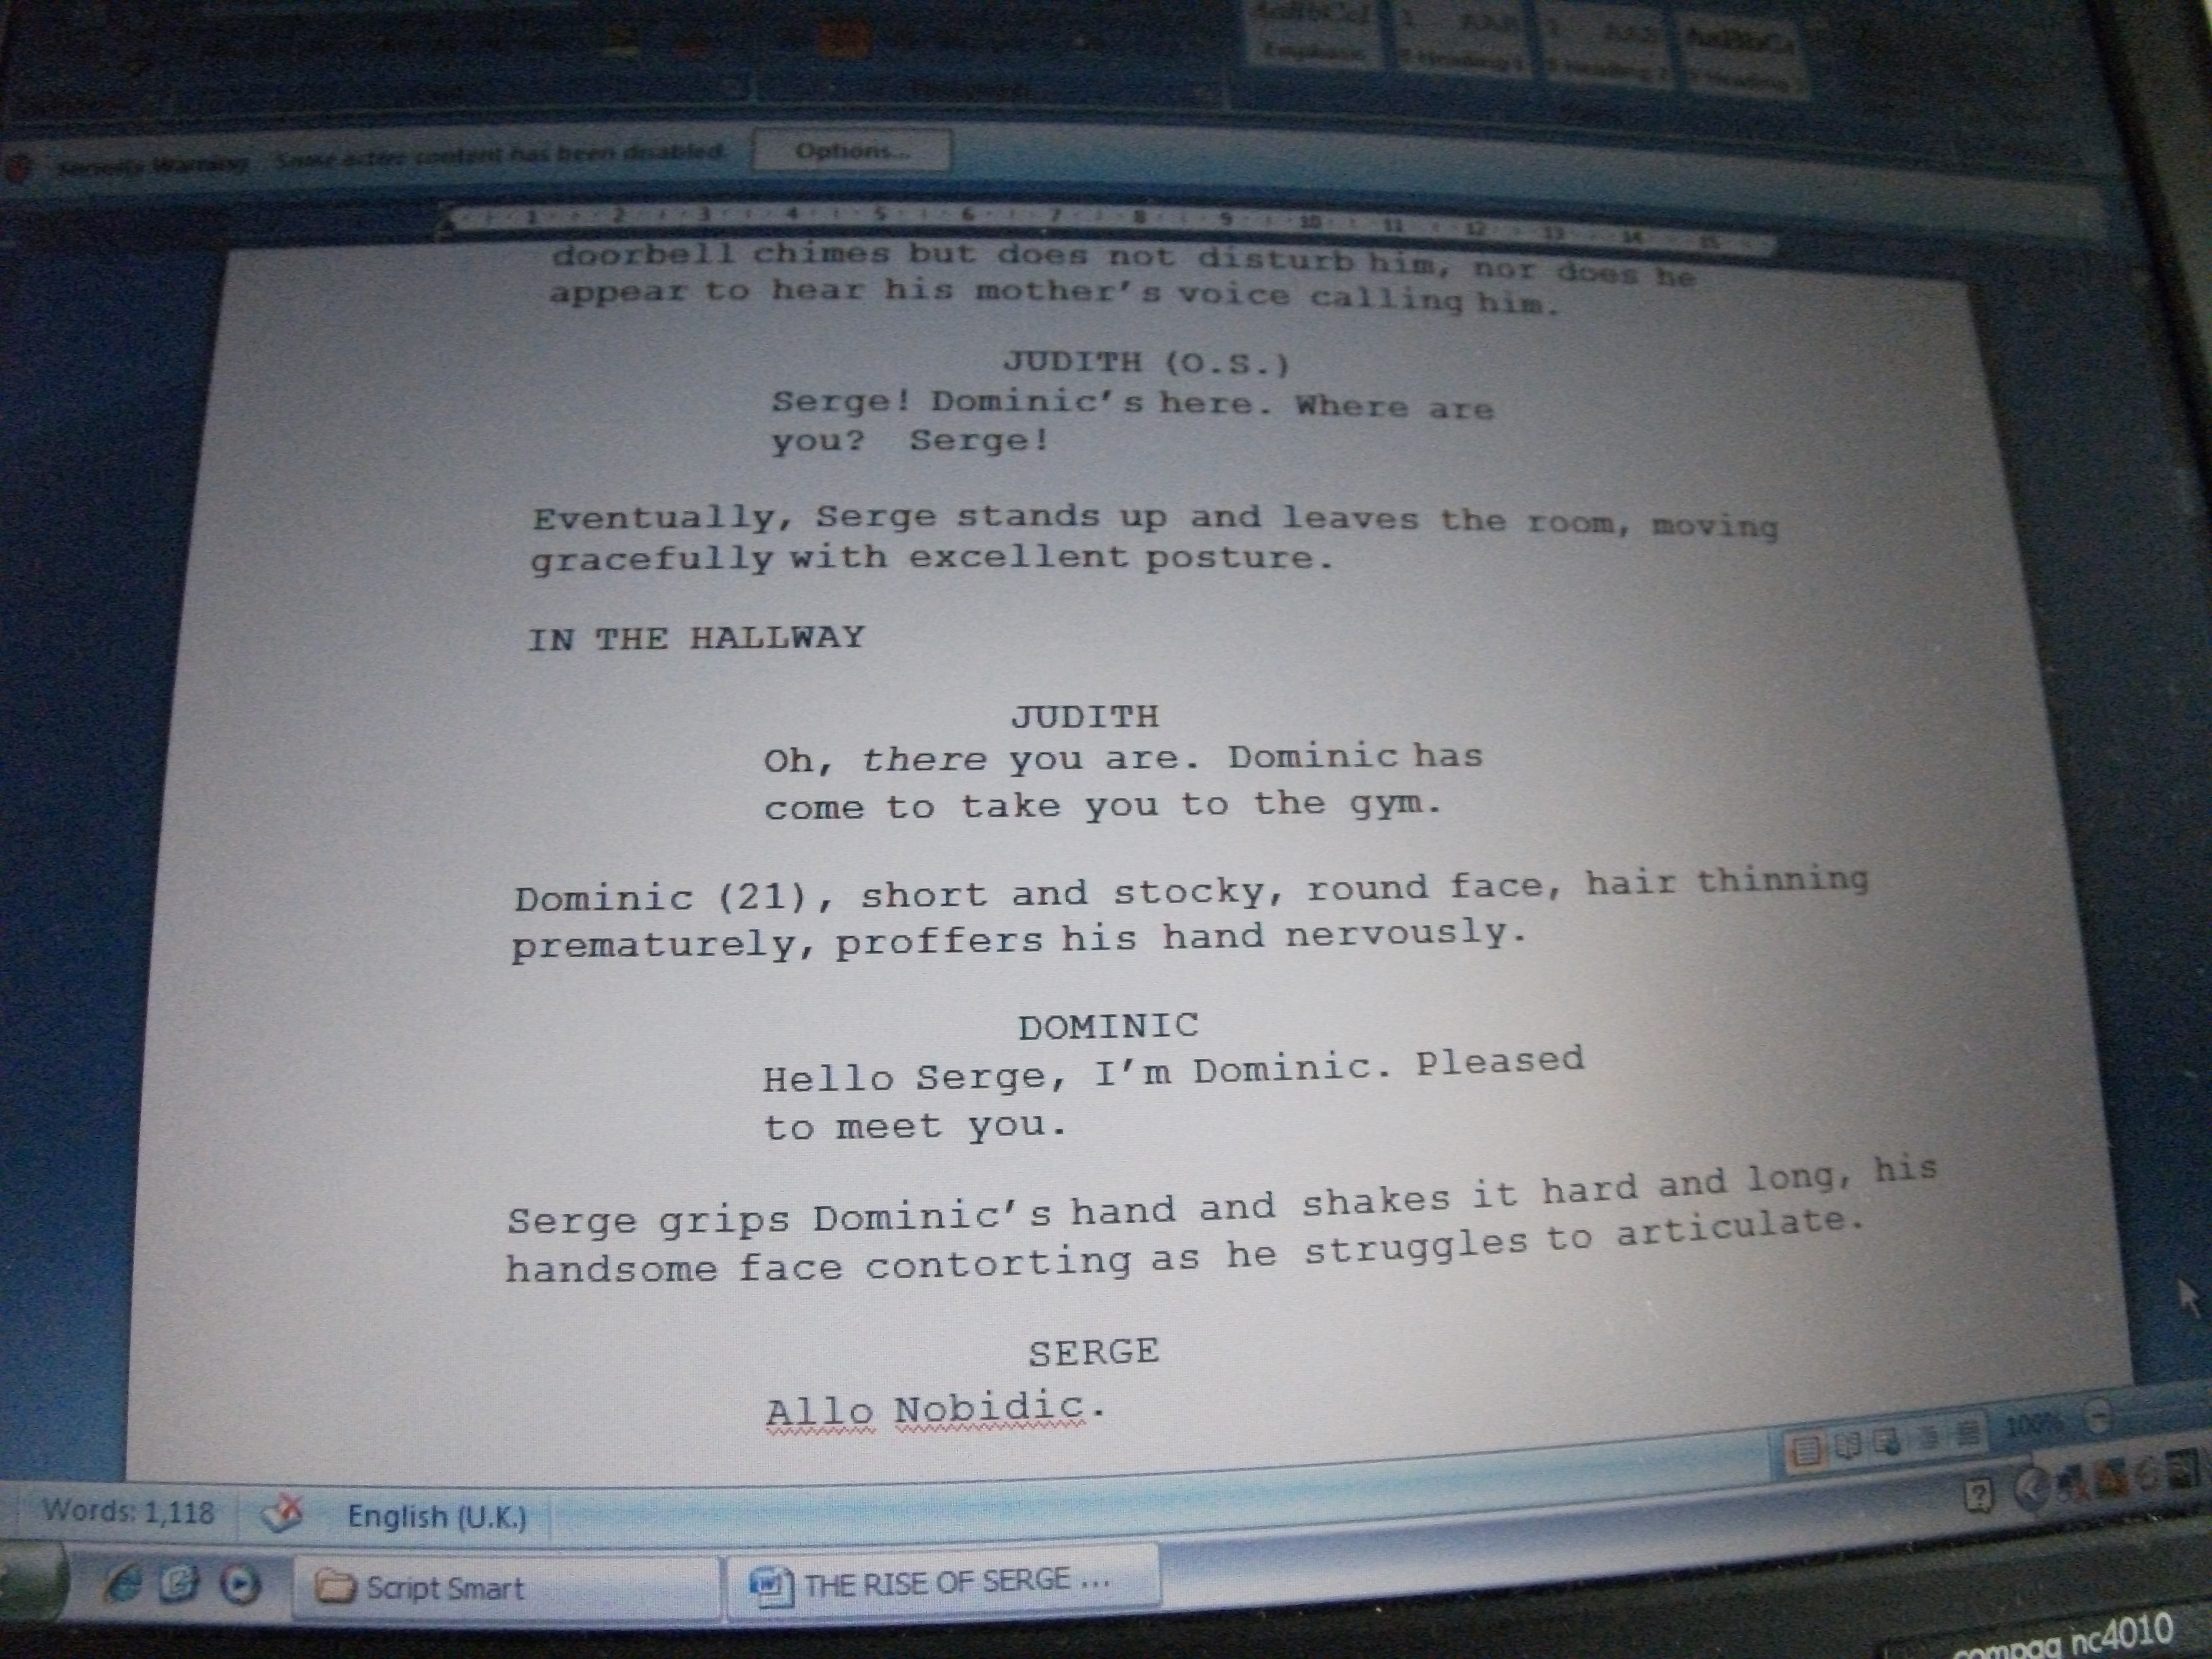 Script writing format bbc